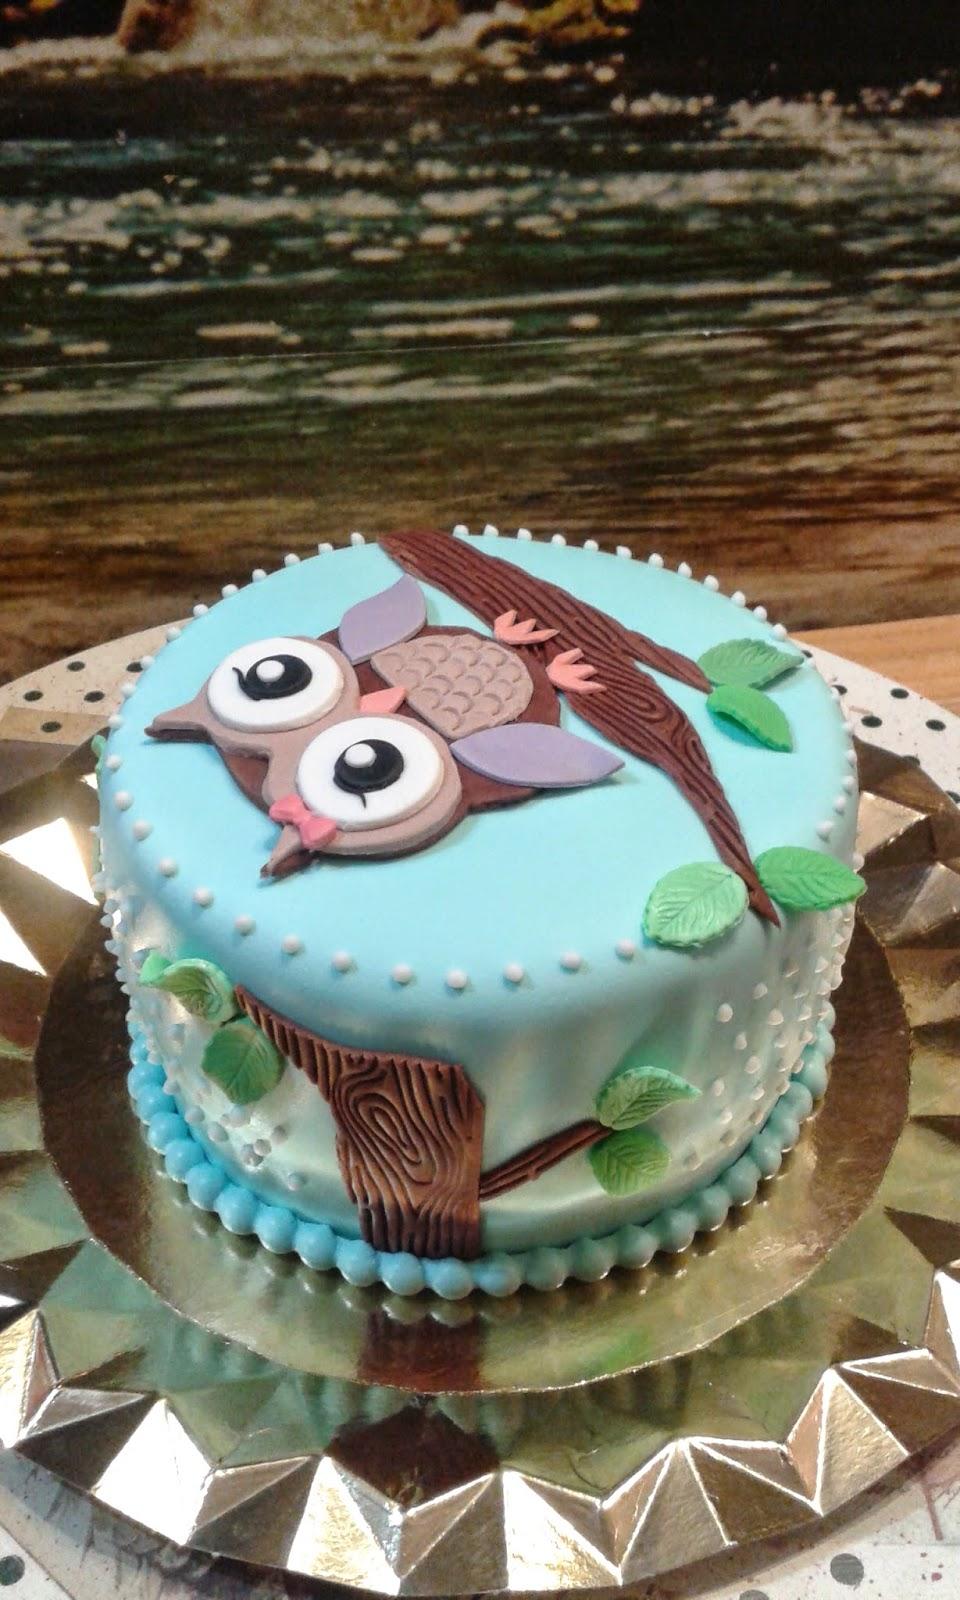 Cupcakes tenerife febrero 2015 - Cupcakes tenerife ...